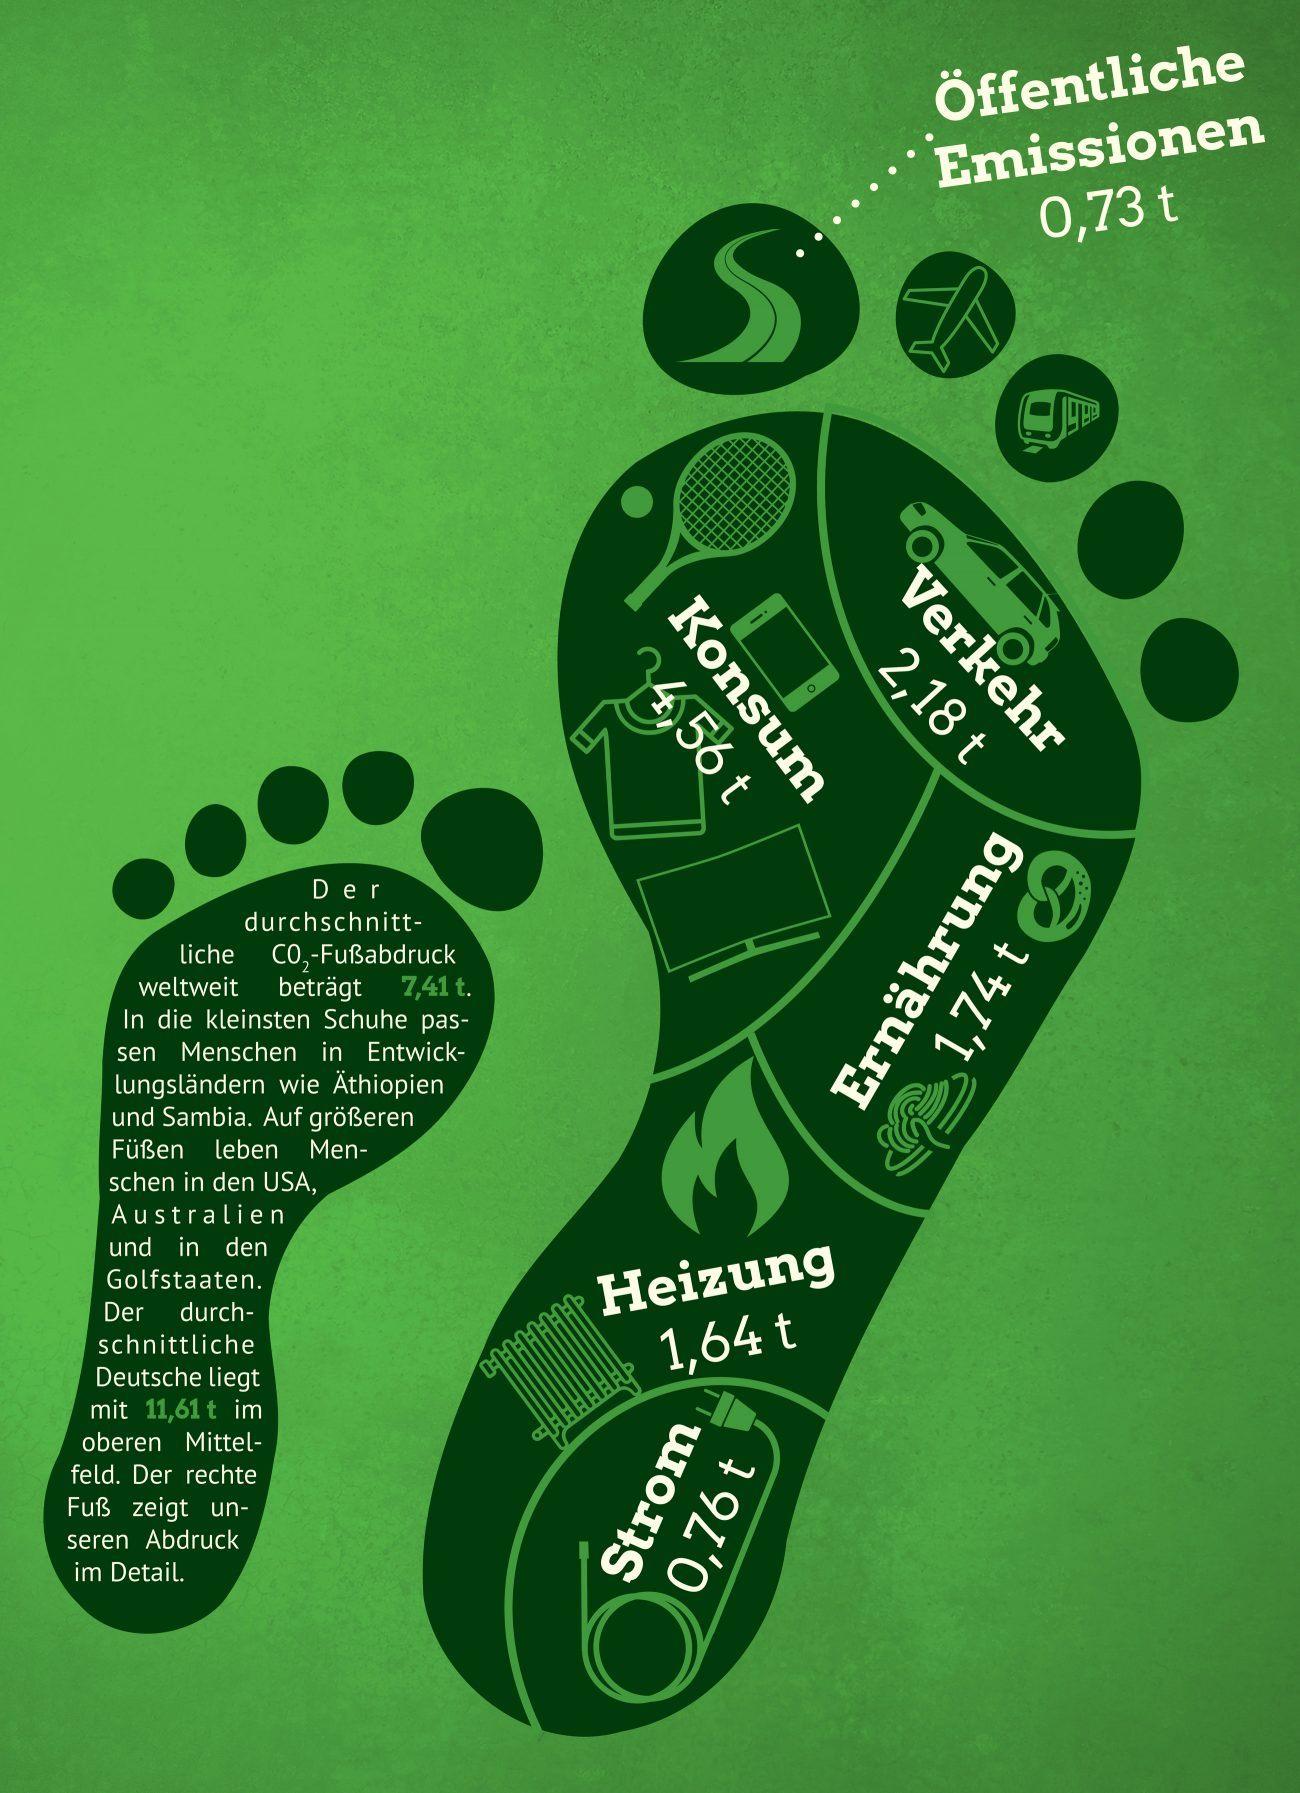 Infografik: CO2-Fußabdruck mit Folgen